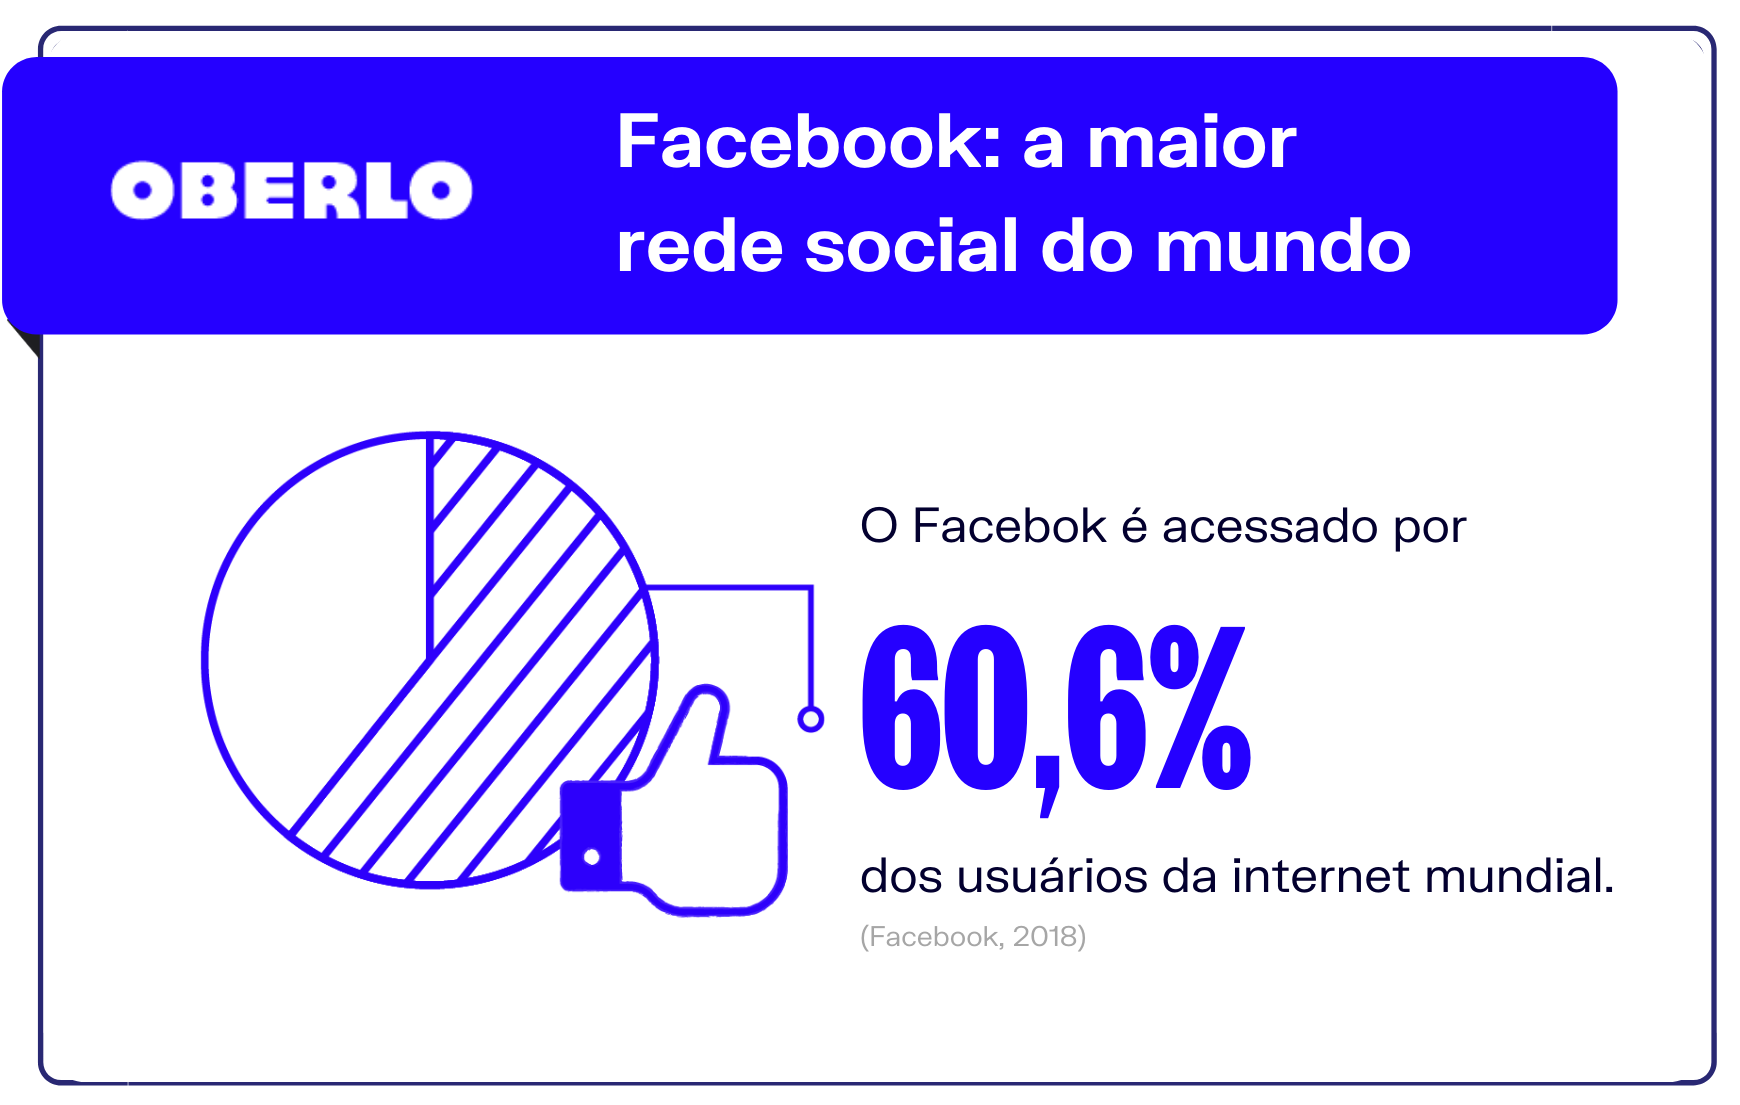 Dados Facebook: a maior rede social do mundo